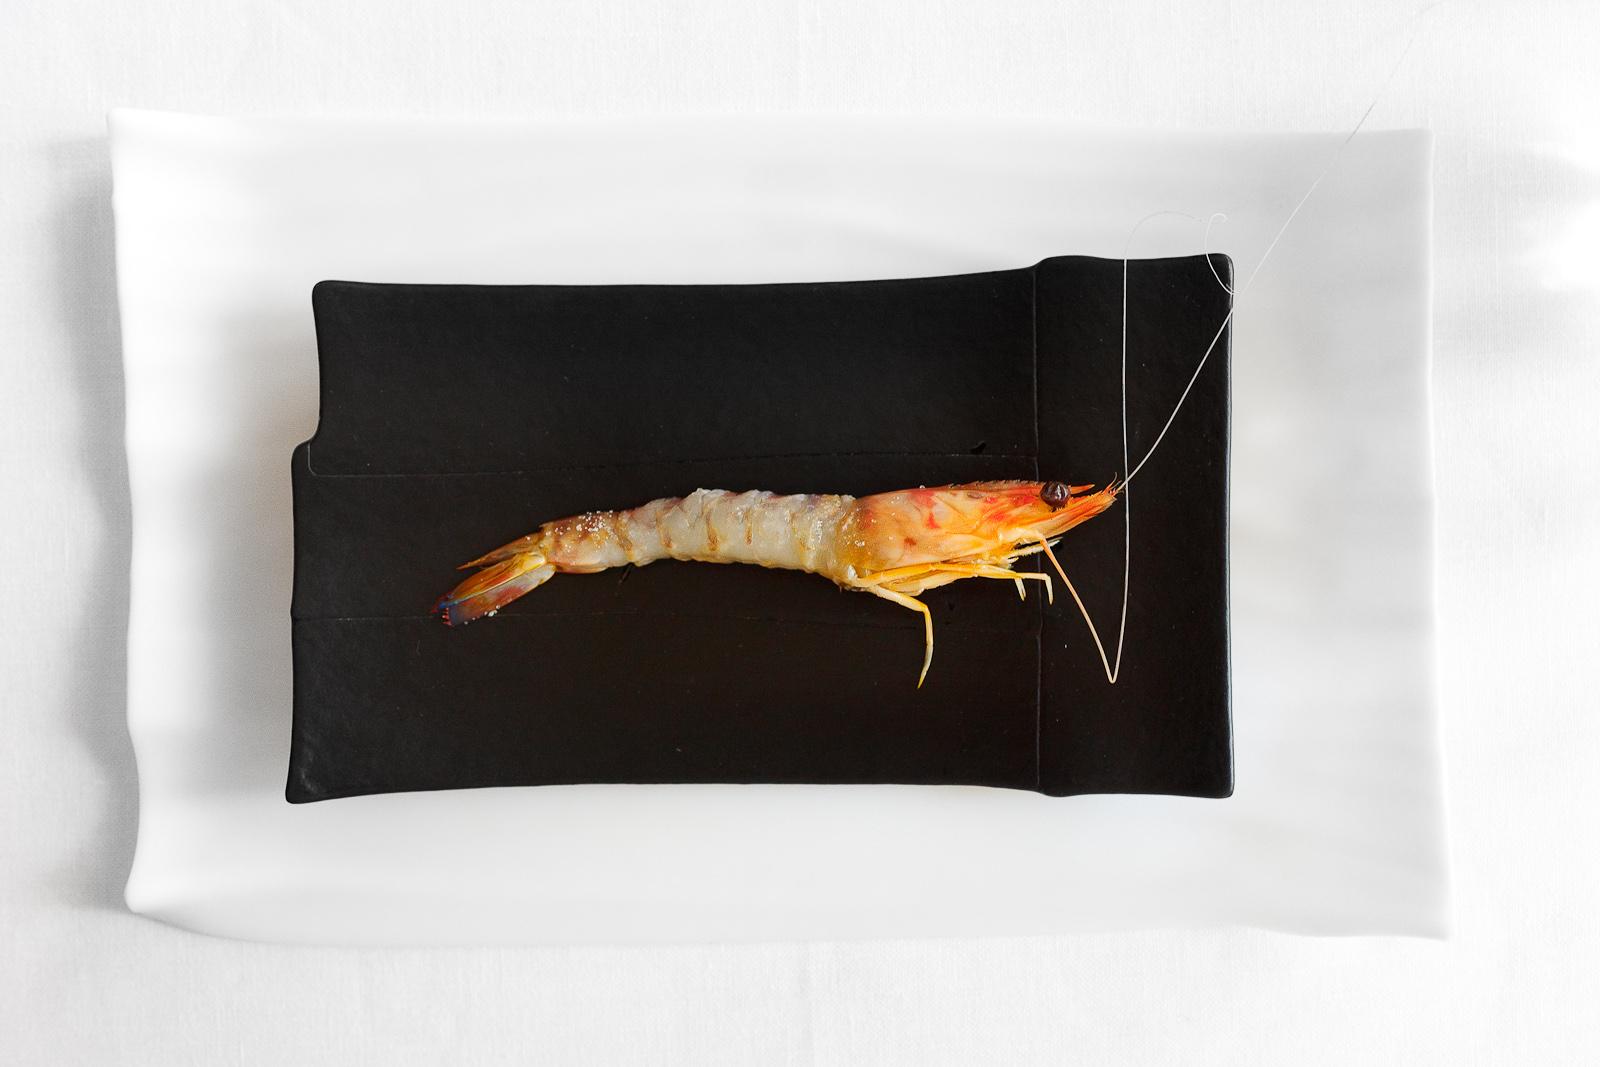 El Bulli, Spain - 12th Course: Boiled shrimp